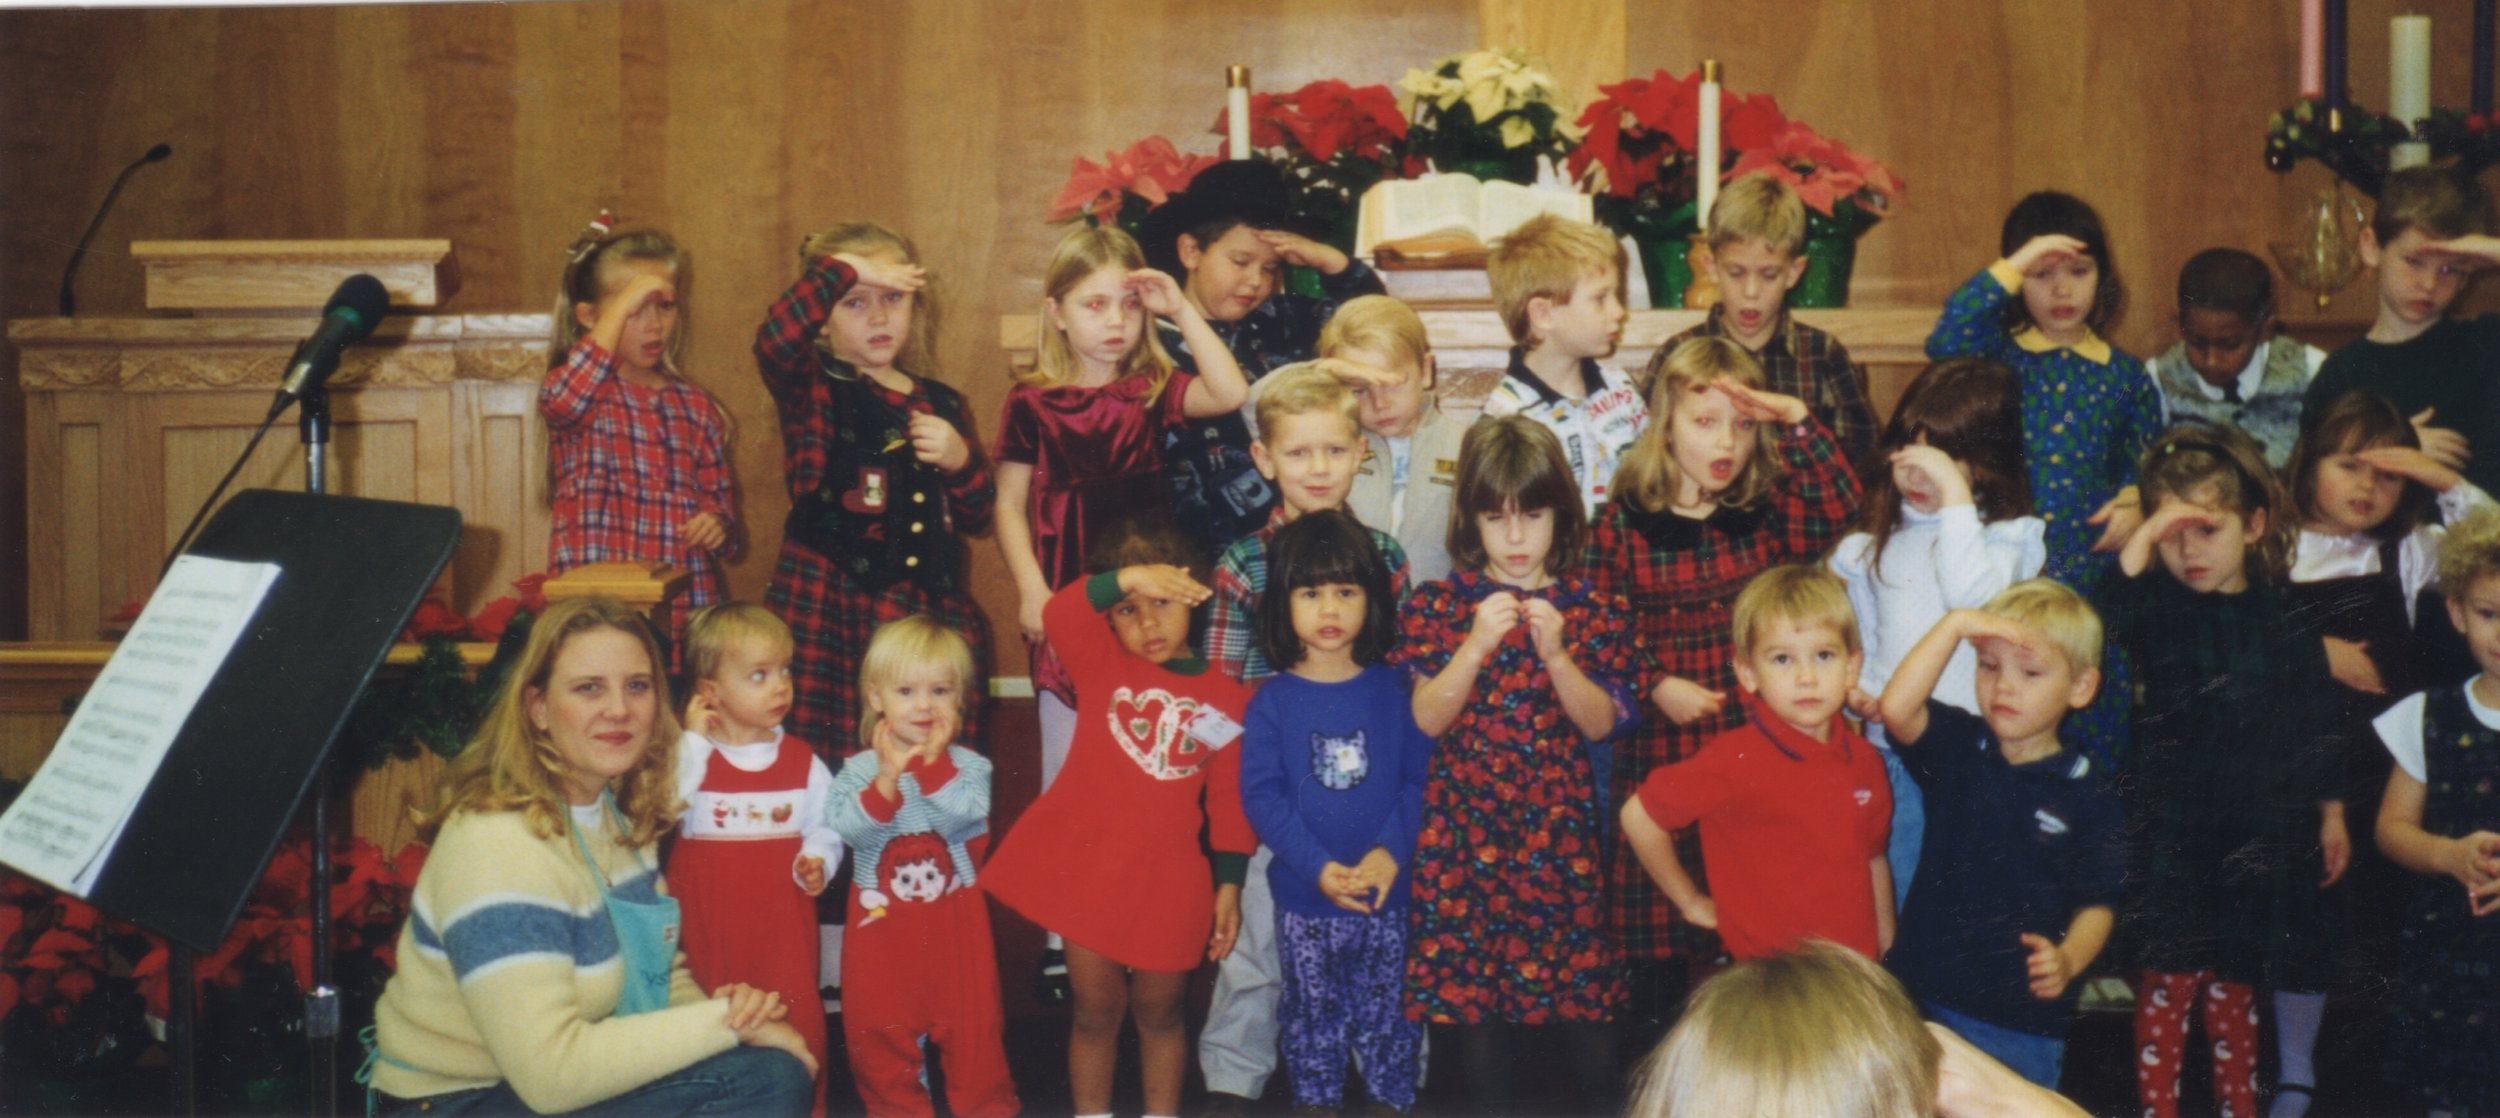 1998 Childrens Choir.jpeg